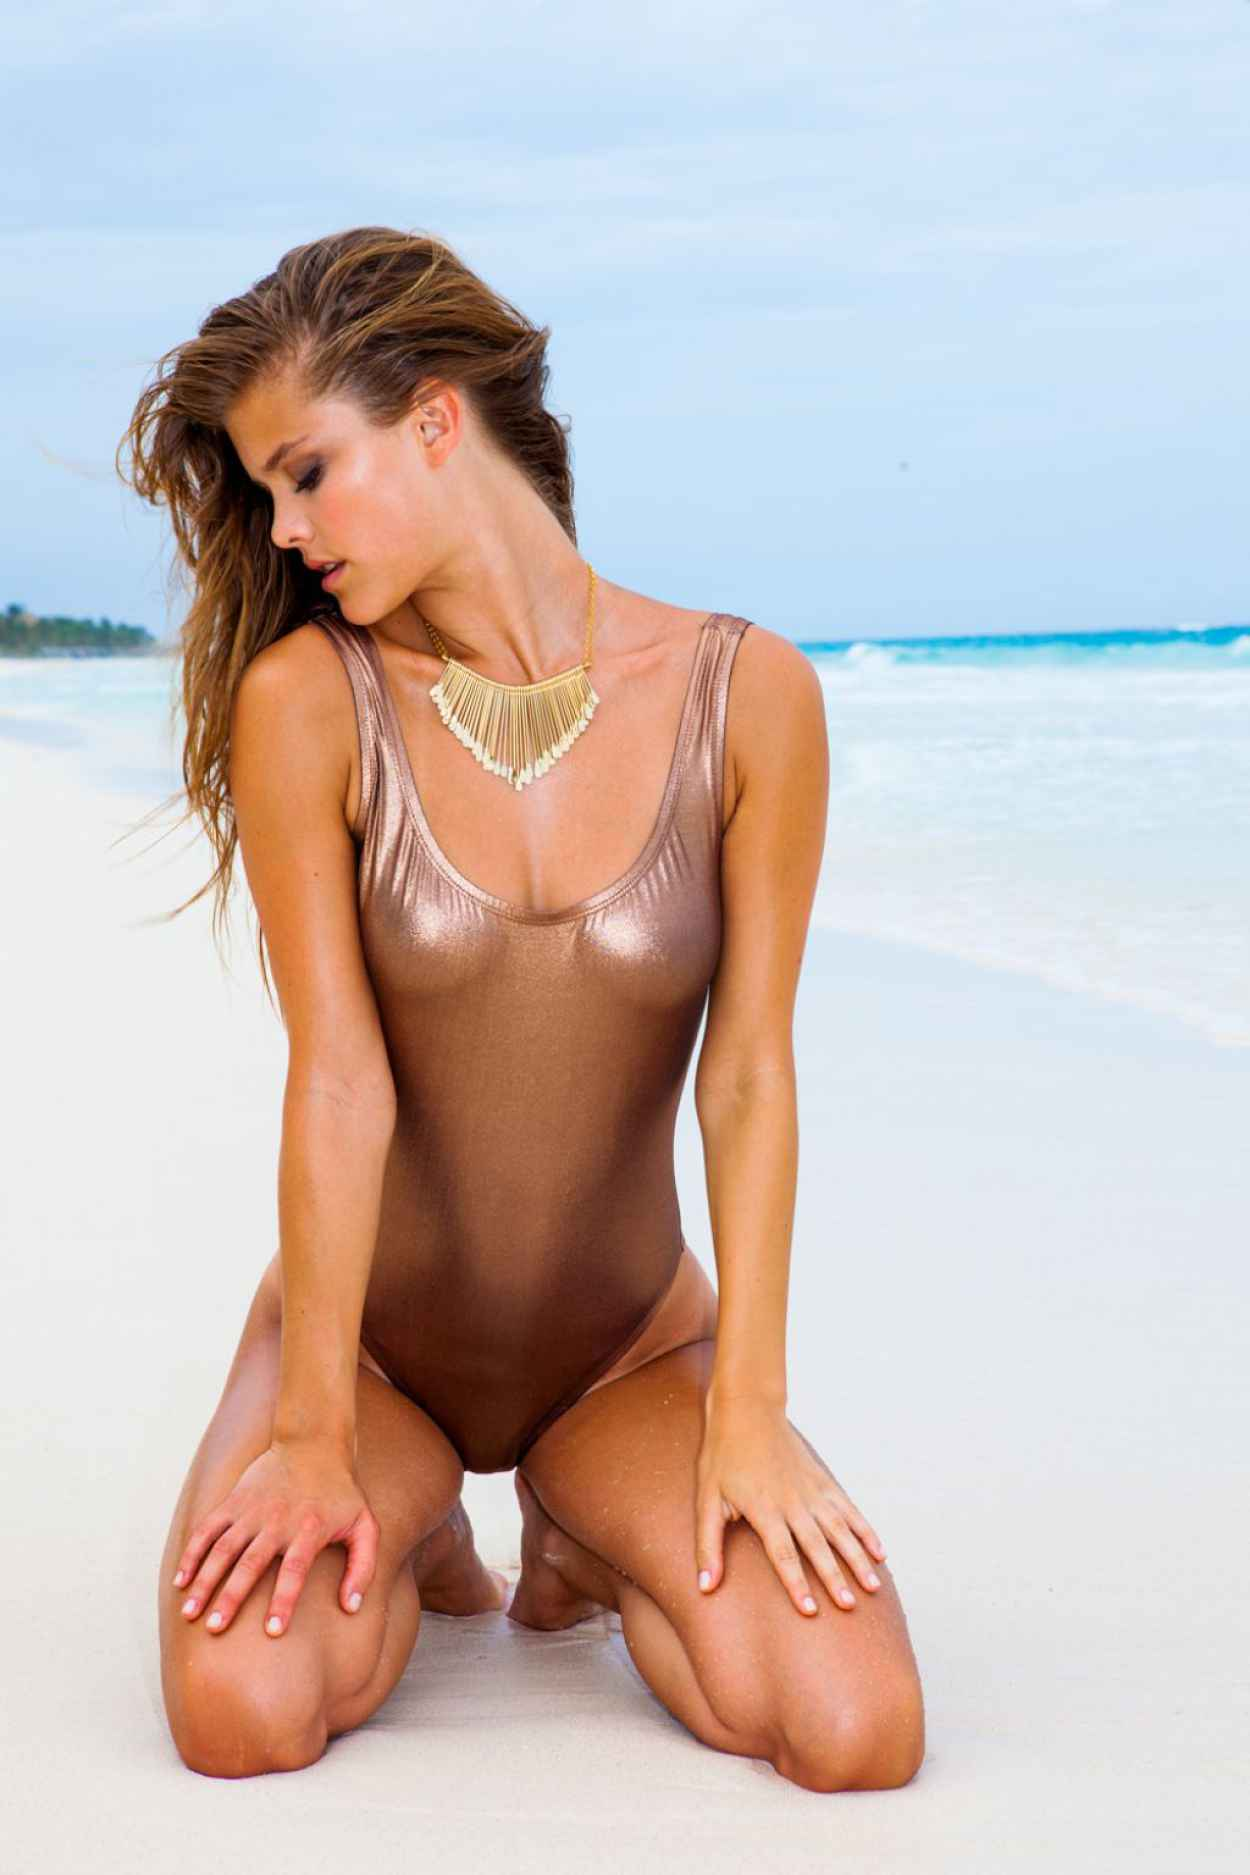 Nina Agdal in a Bikini - Sauvage Swimwear 2015 - 19 High Quality Photos-5